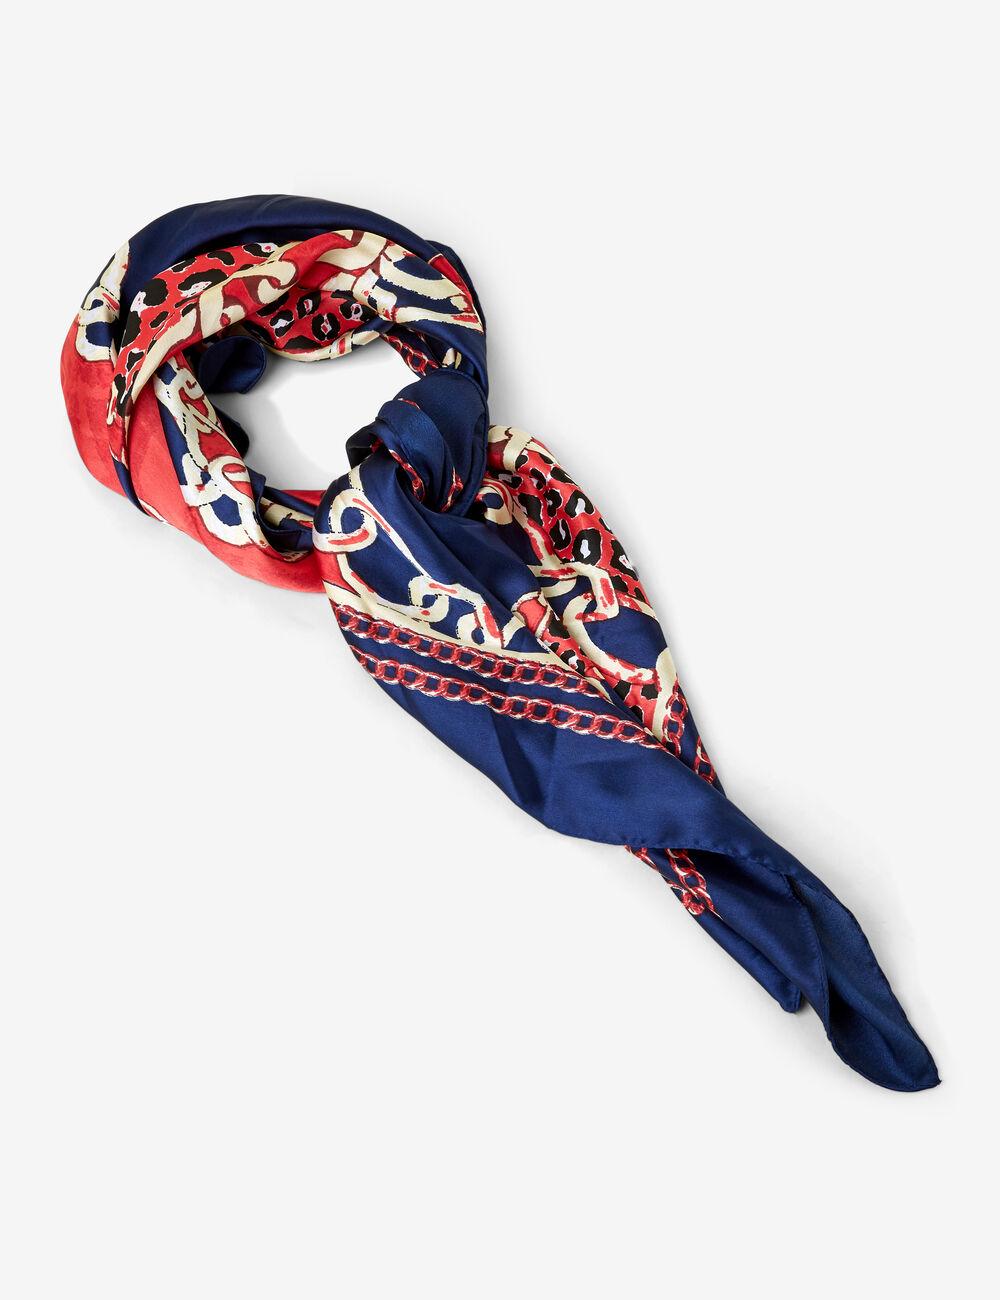 d1e1c2b4fed Foulard imprimé bleu marine et rouge femme • Jennyfer